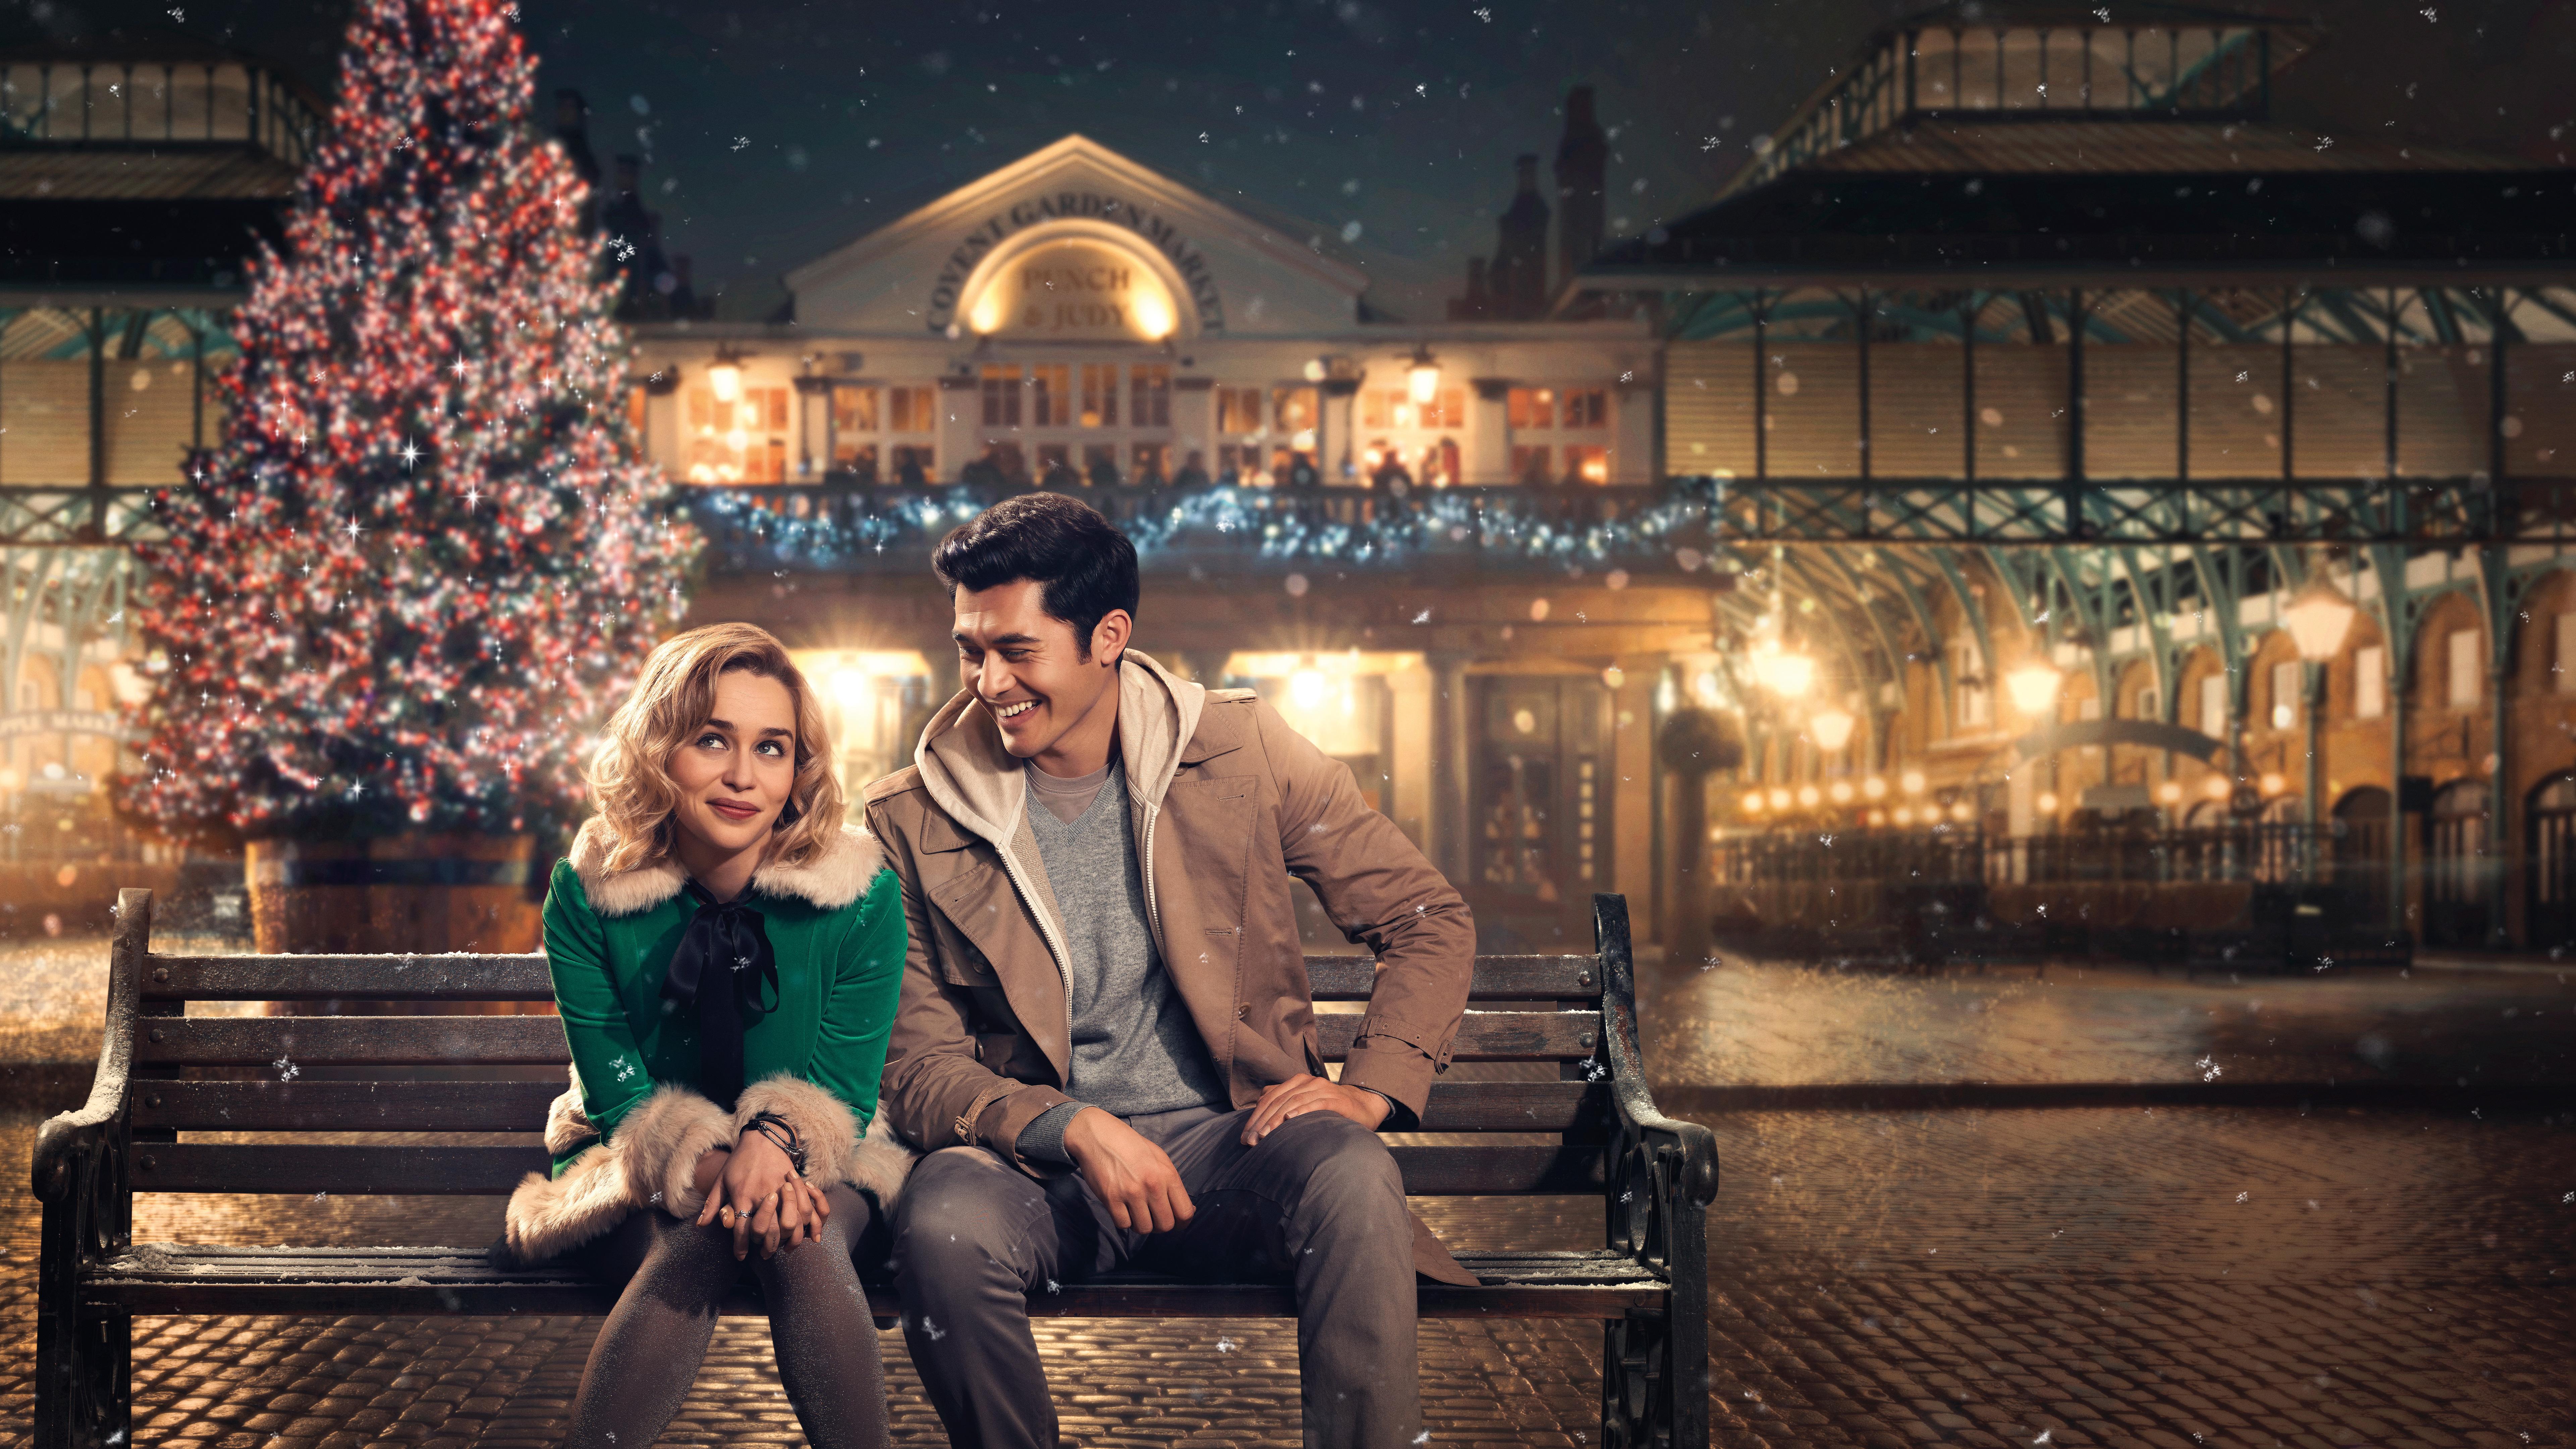 last-christmas-movie-12k-sm.jpg